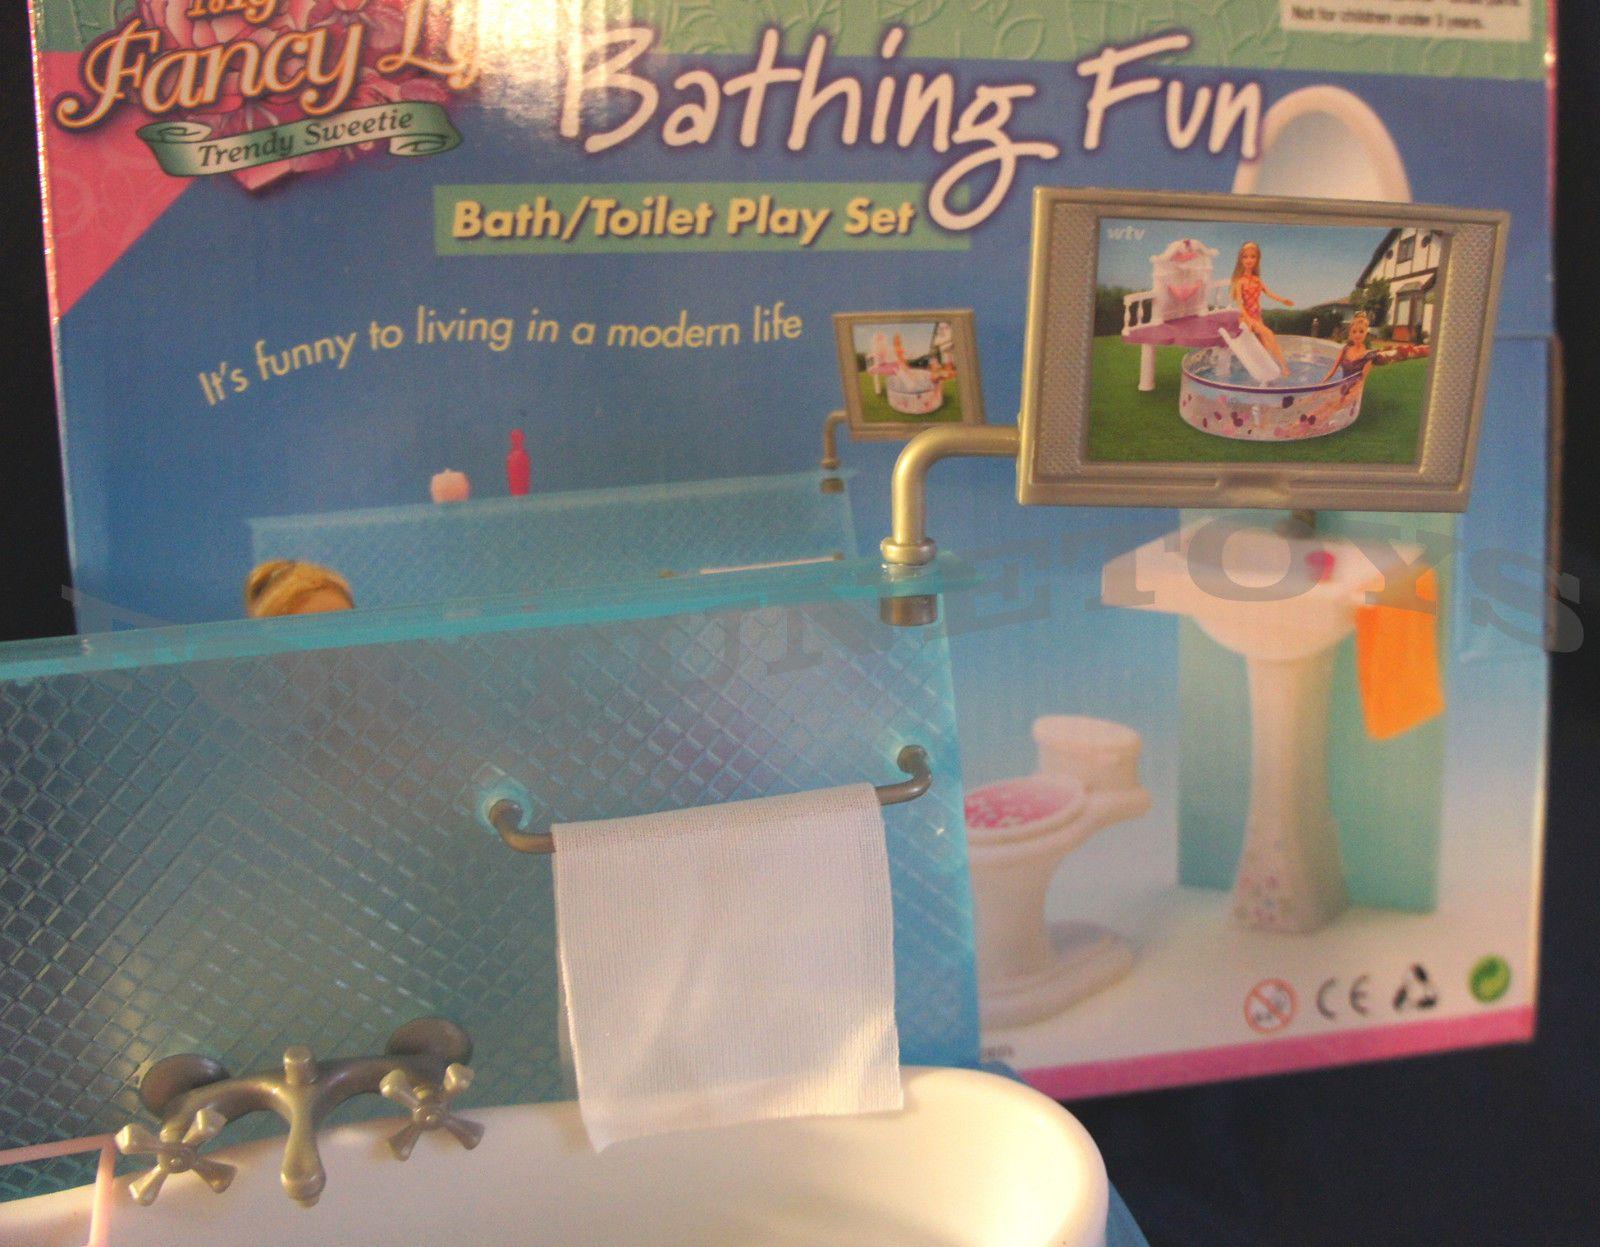 My Fancy Life Barbie Size Dollhouse Furniture Bathing Fun Bath//Toilet Play Set